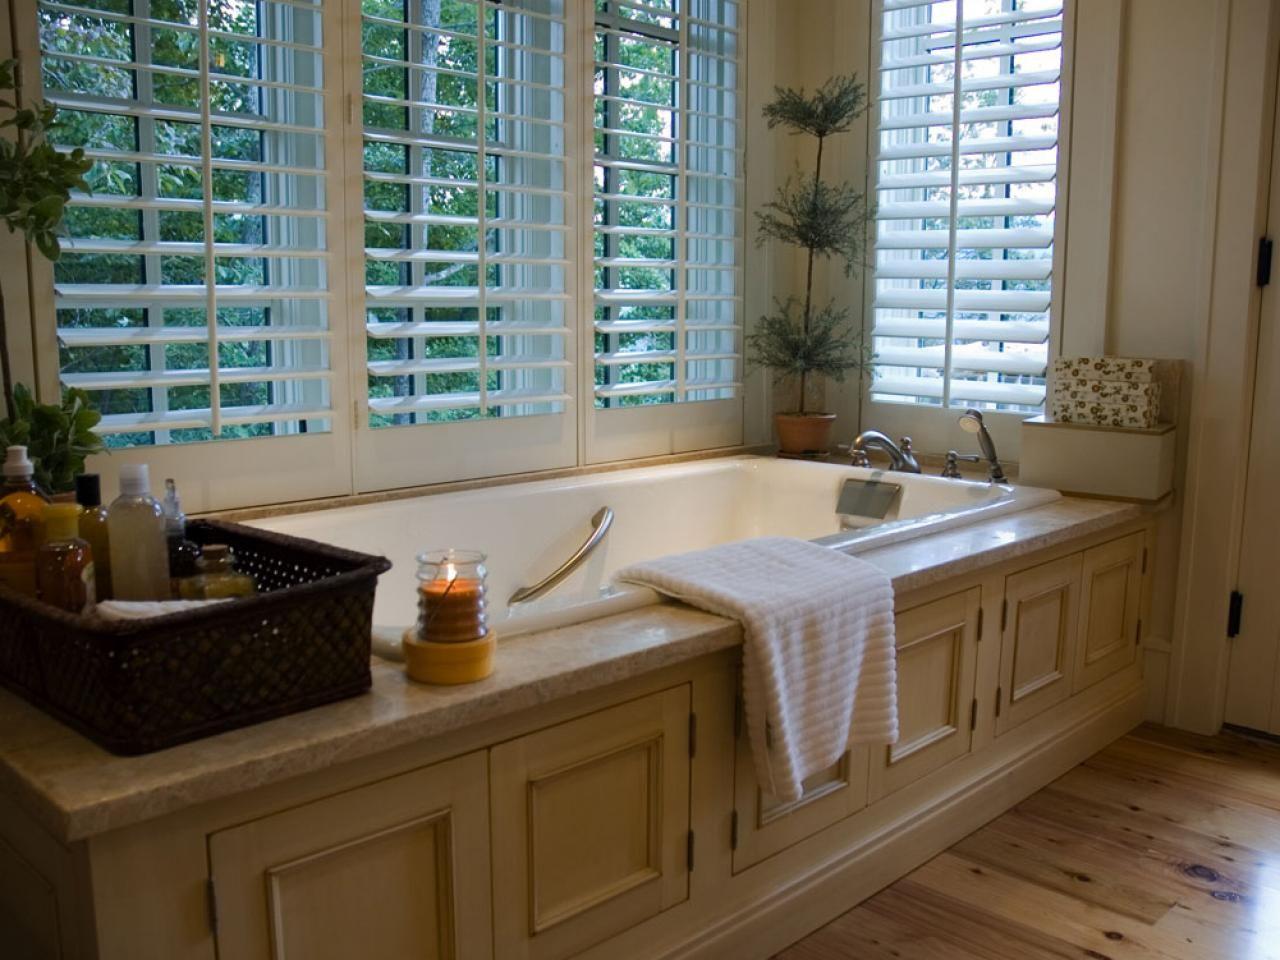 Pics Of Beautiful Bathrooms From HGTV Dream Homes HGTV Dream Home HGTV